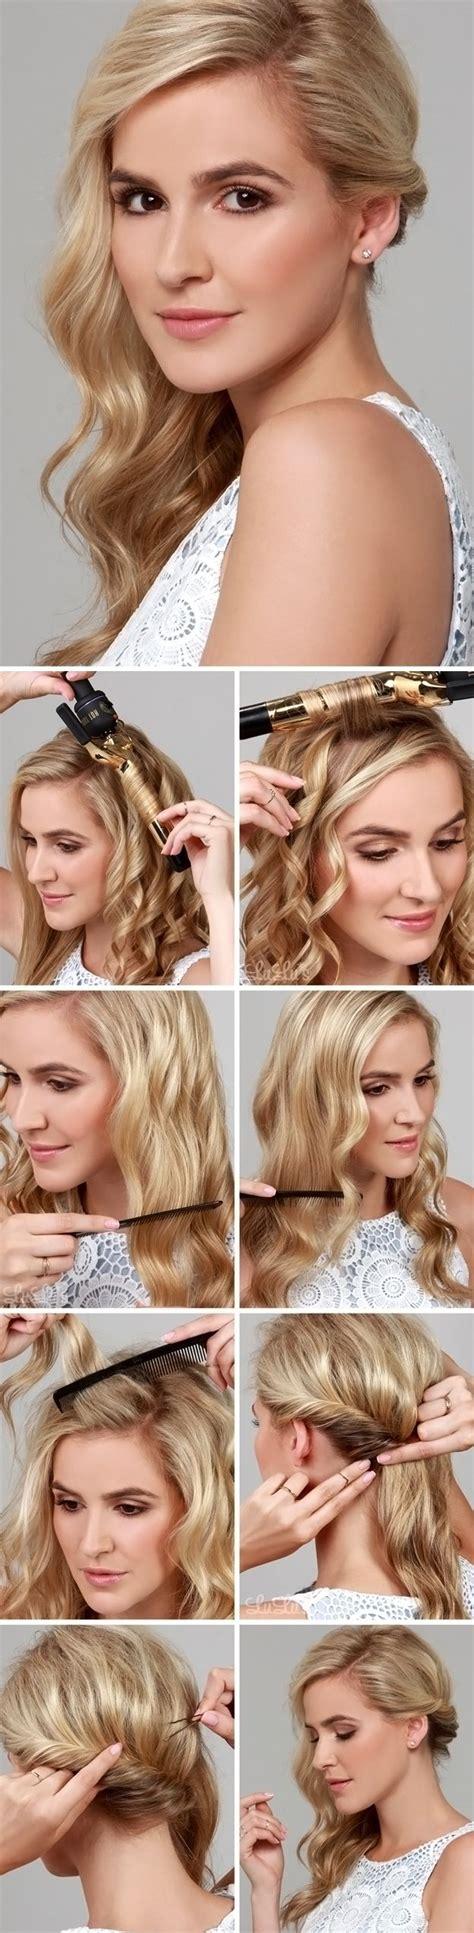 Easy Wedding Guest Hairstyles For Medium Hair by Best 25 Wedding Guest Hairstyles Ideas On